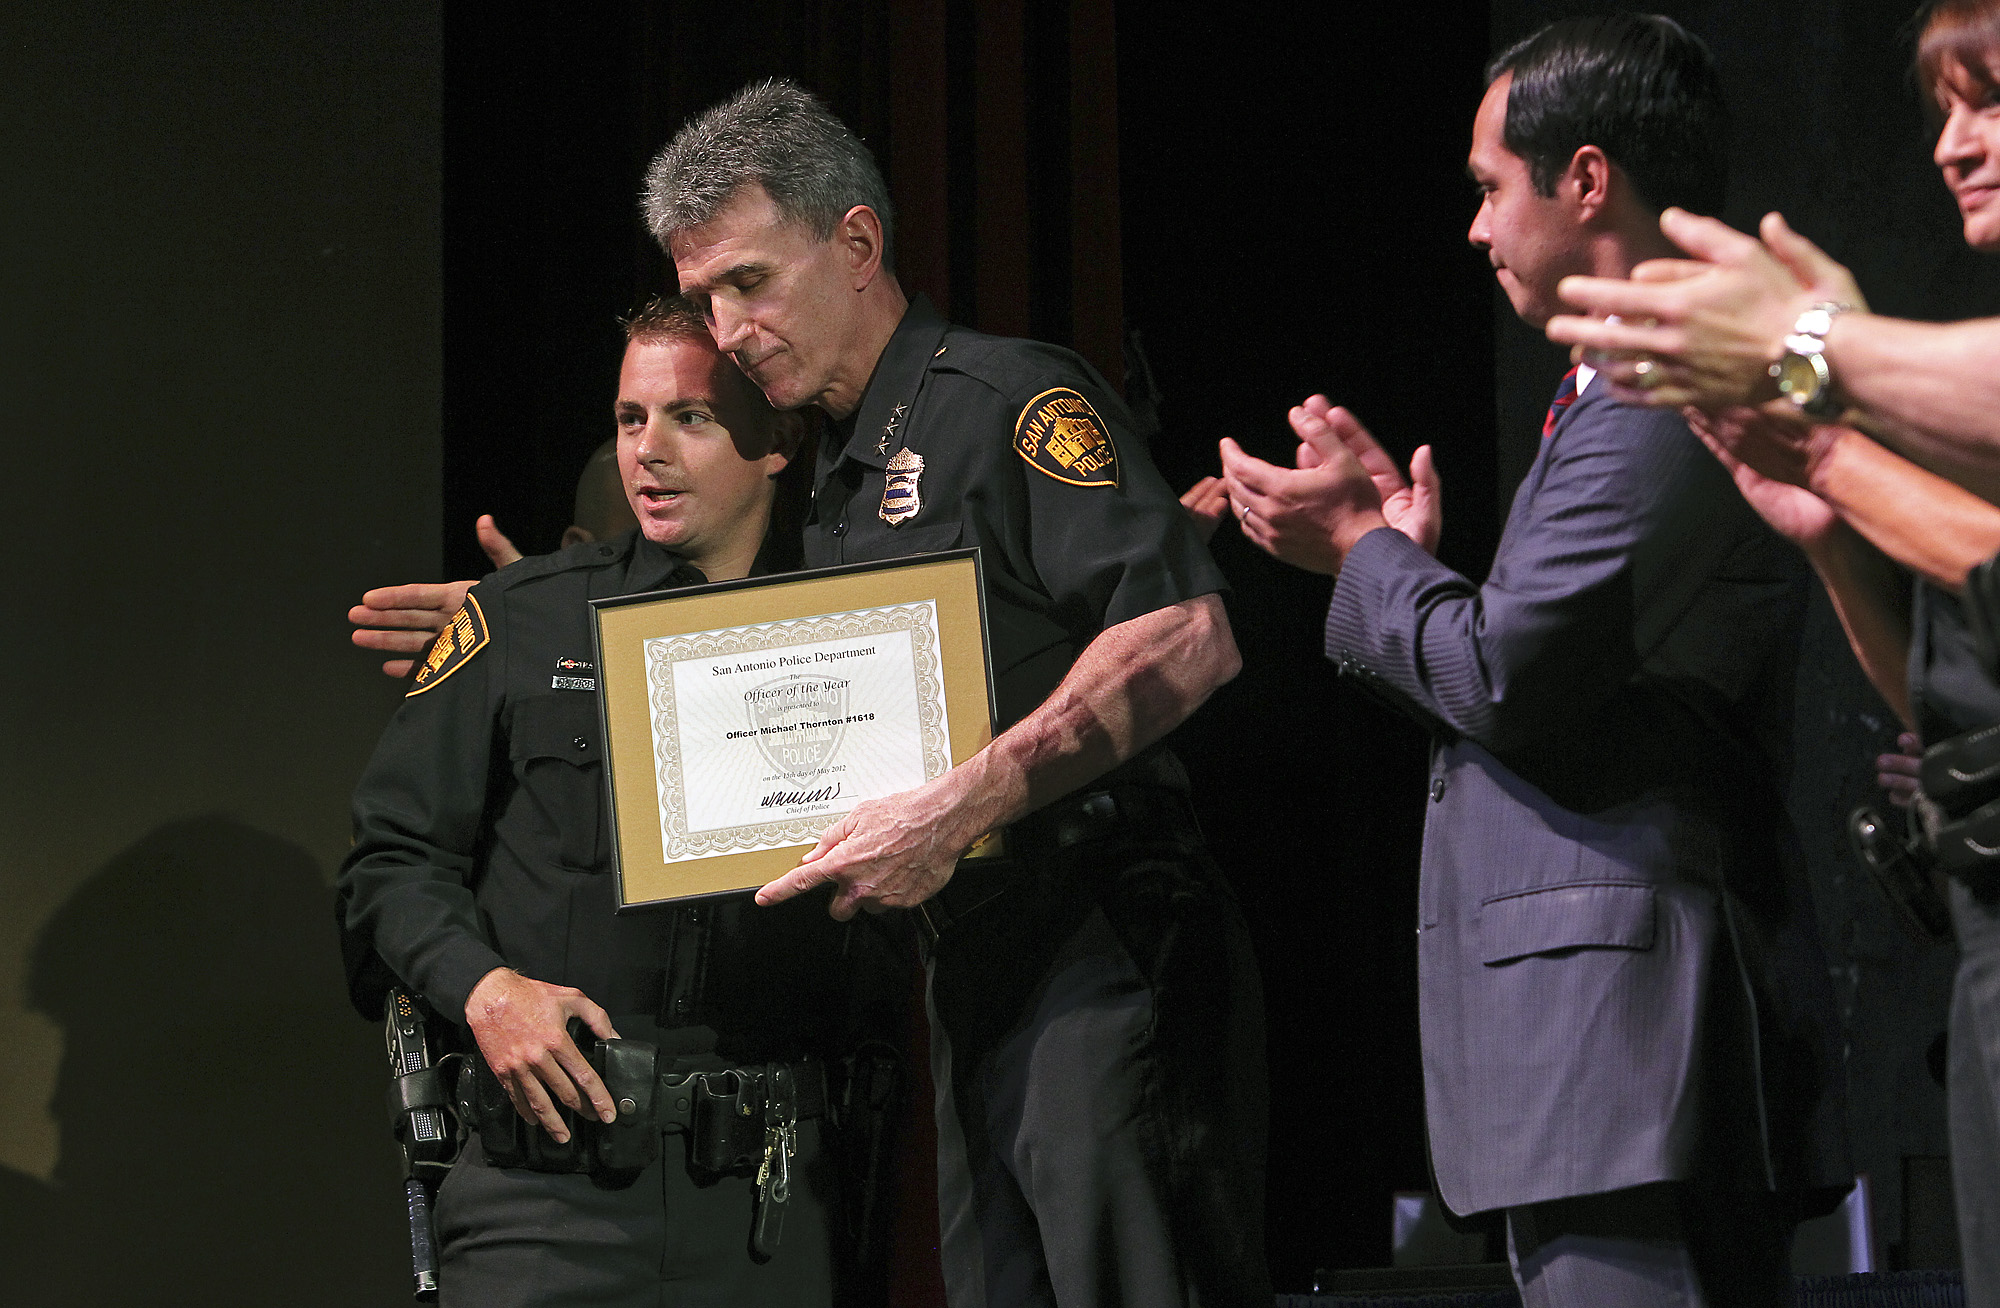 RoboCop' leads list of SAPD honorees - San Antonio Express-News